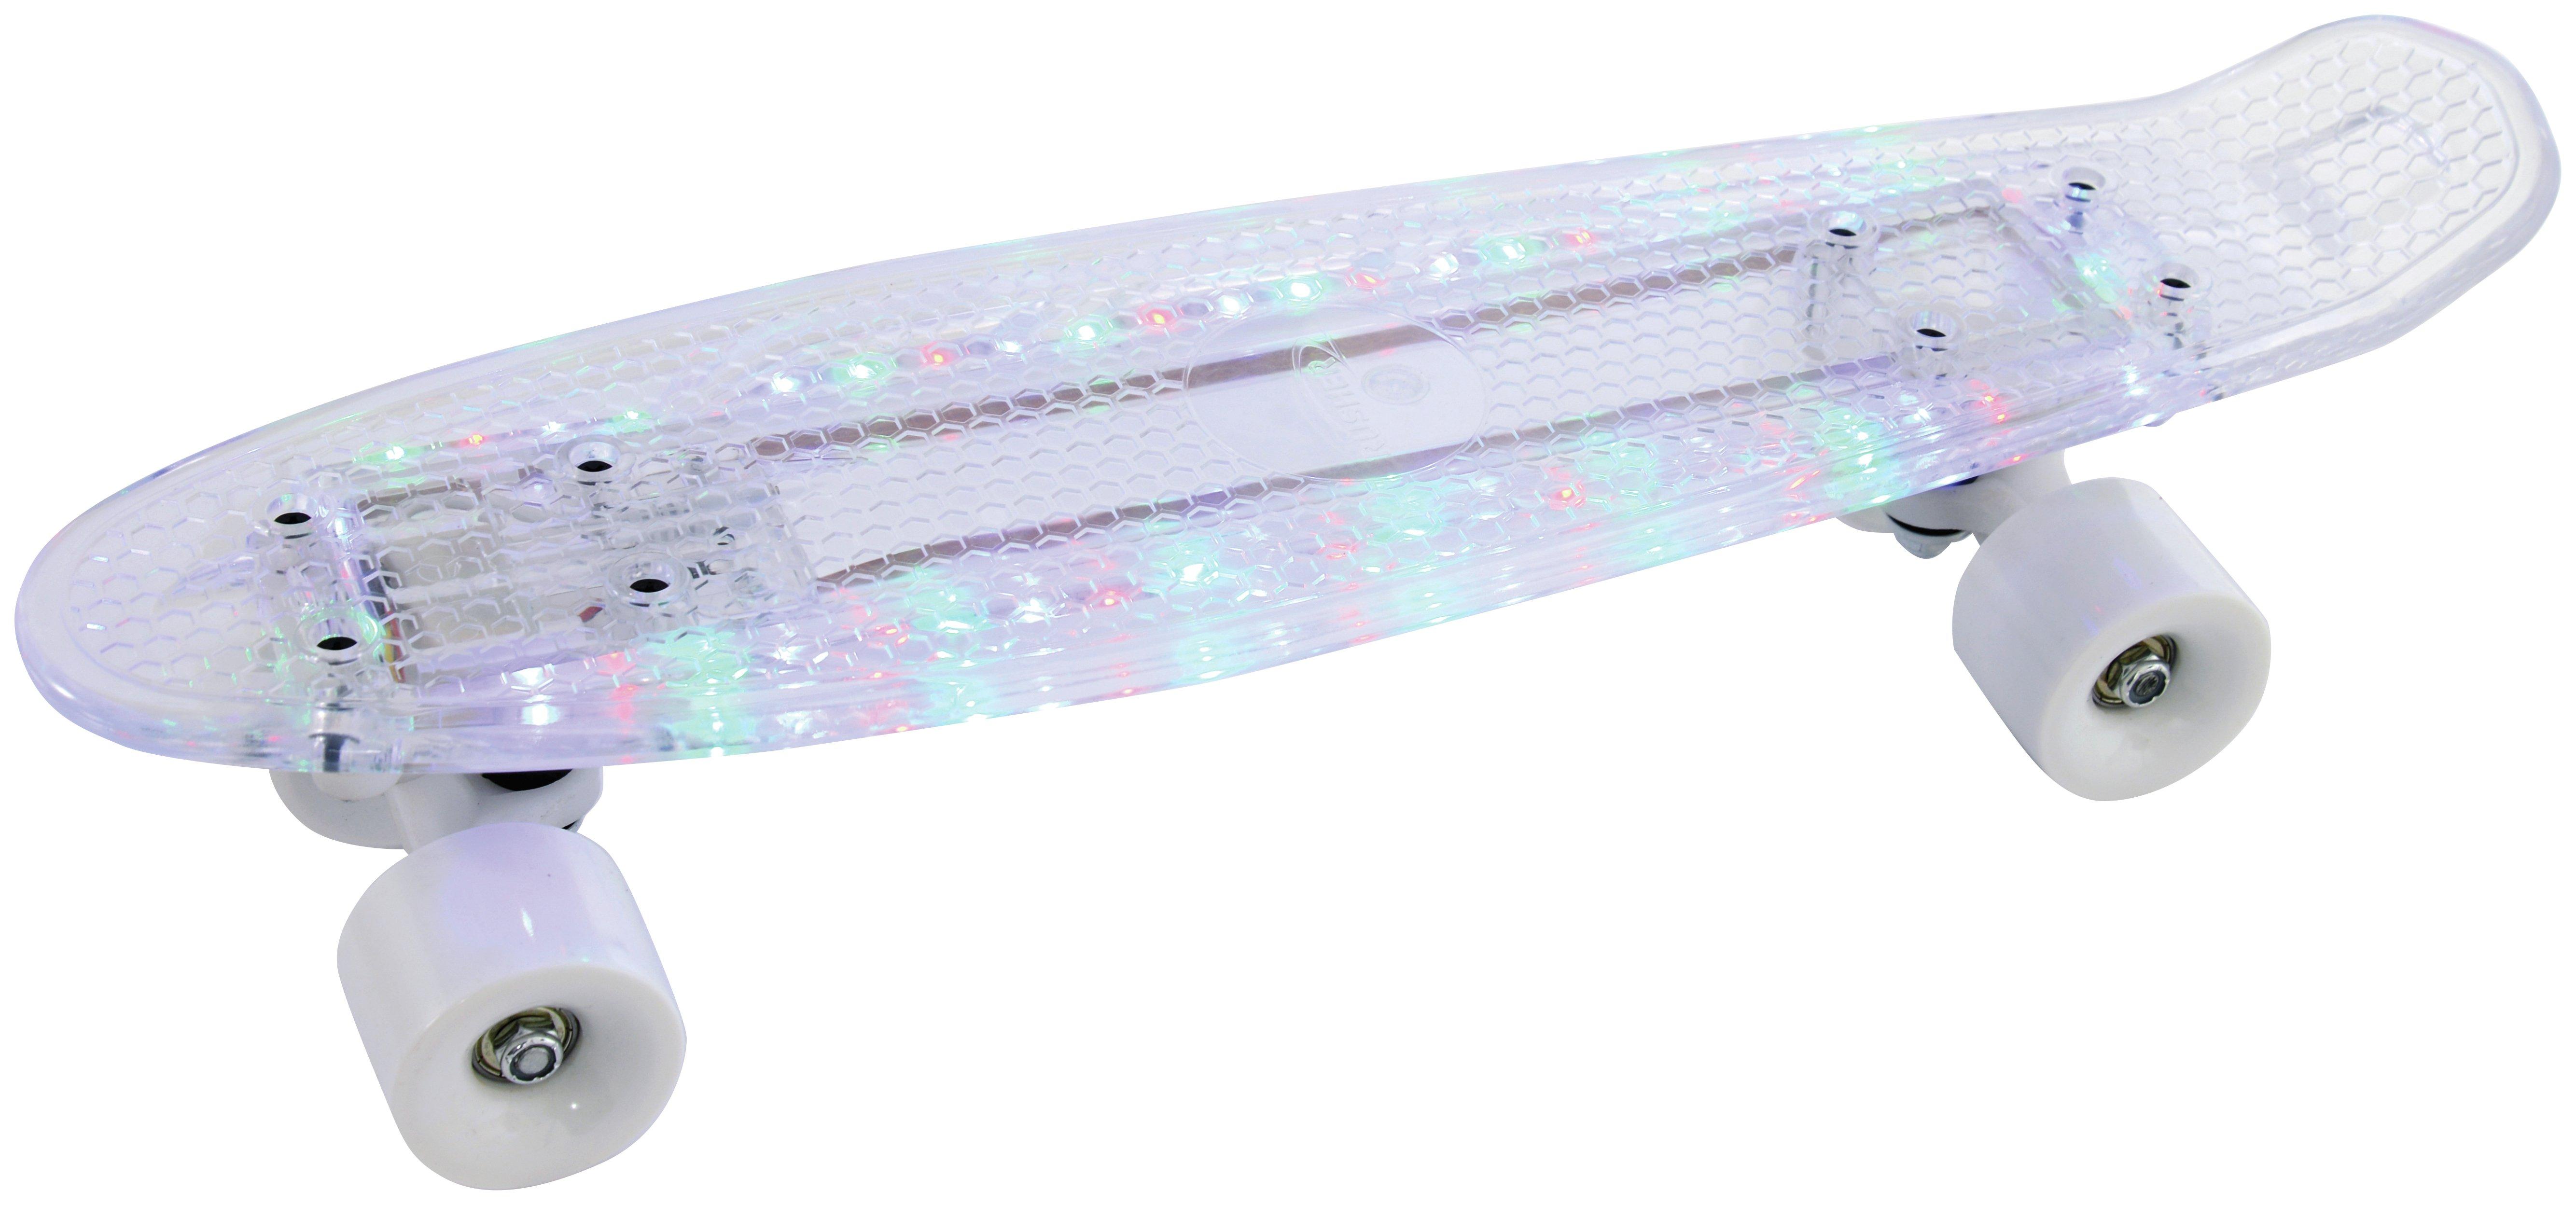 Image of Bored - XLI Light Up Cruiser Skateboard